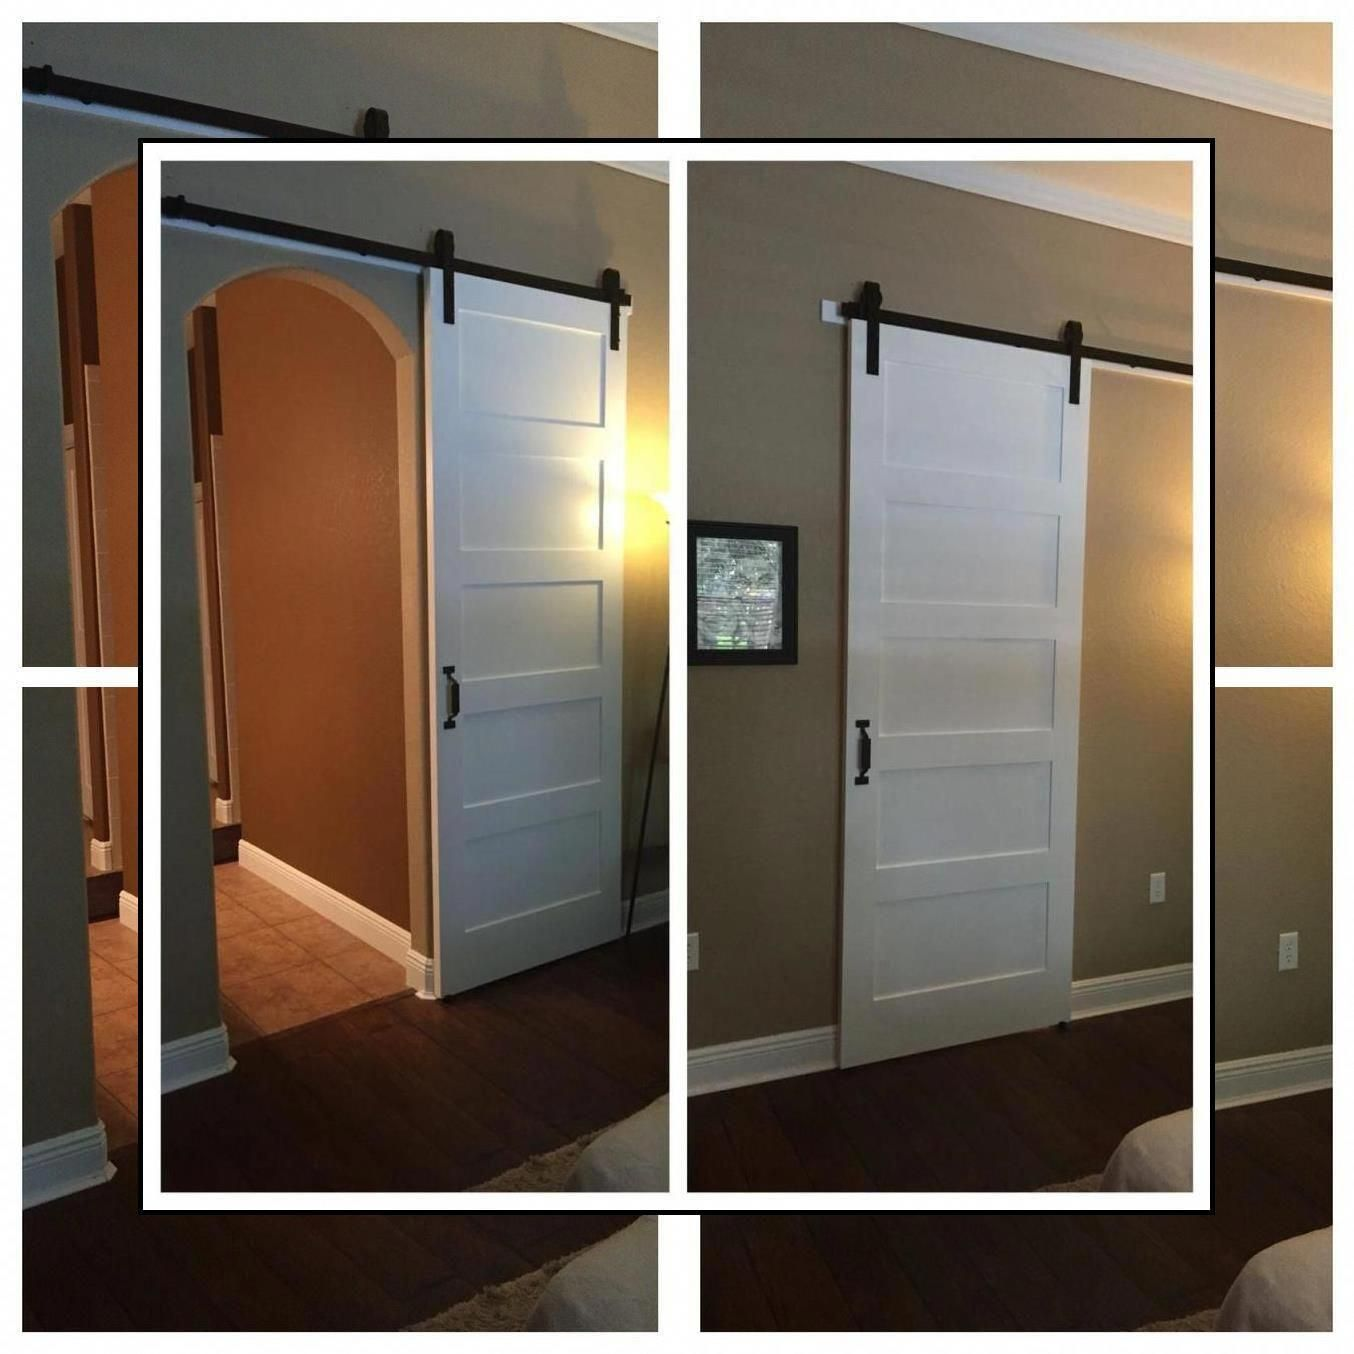 I Appreciate This Fantastic Photo Archedinteriorbarndoors In 2020 Interior Barn Doors Barn Doors For Sale Sliding Bathroom Doors